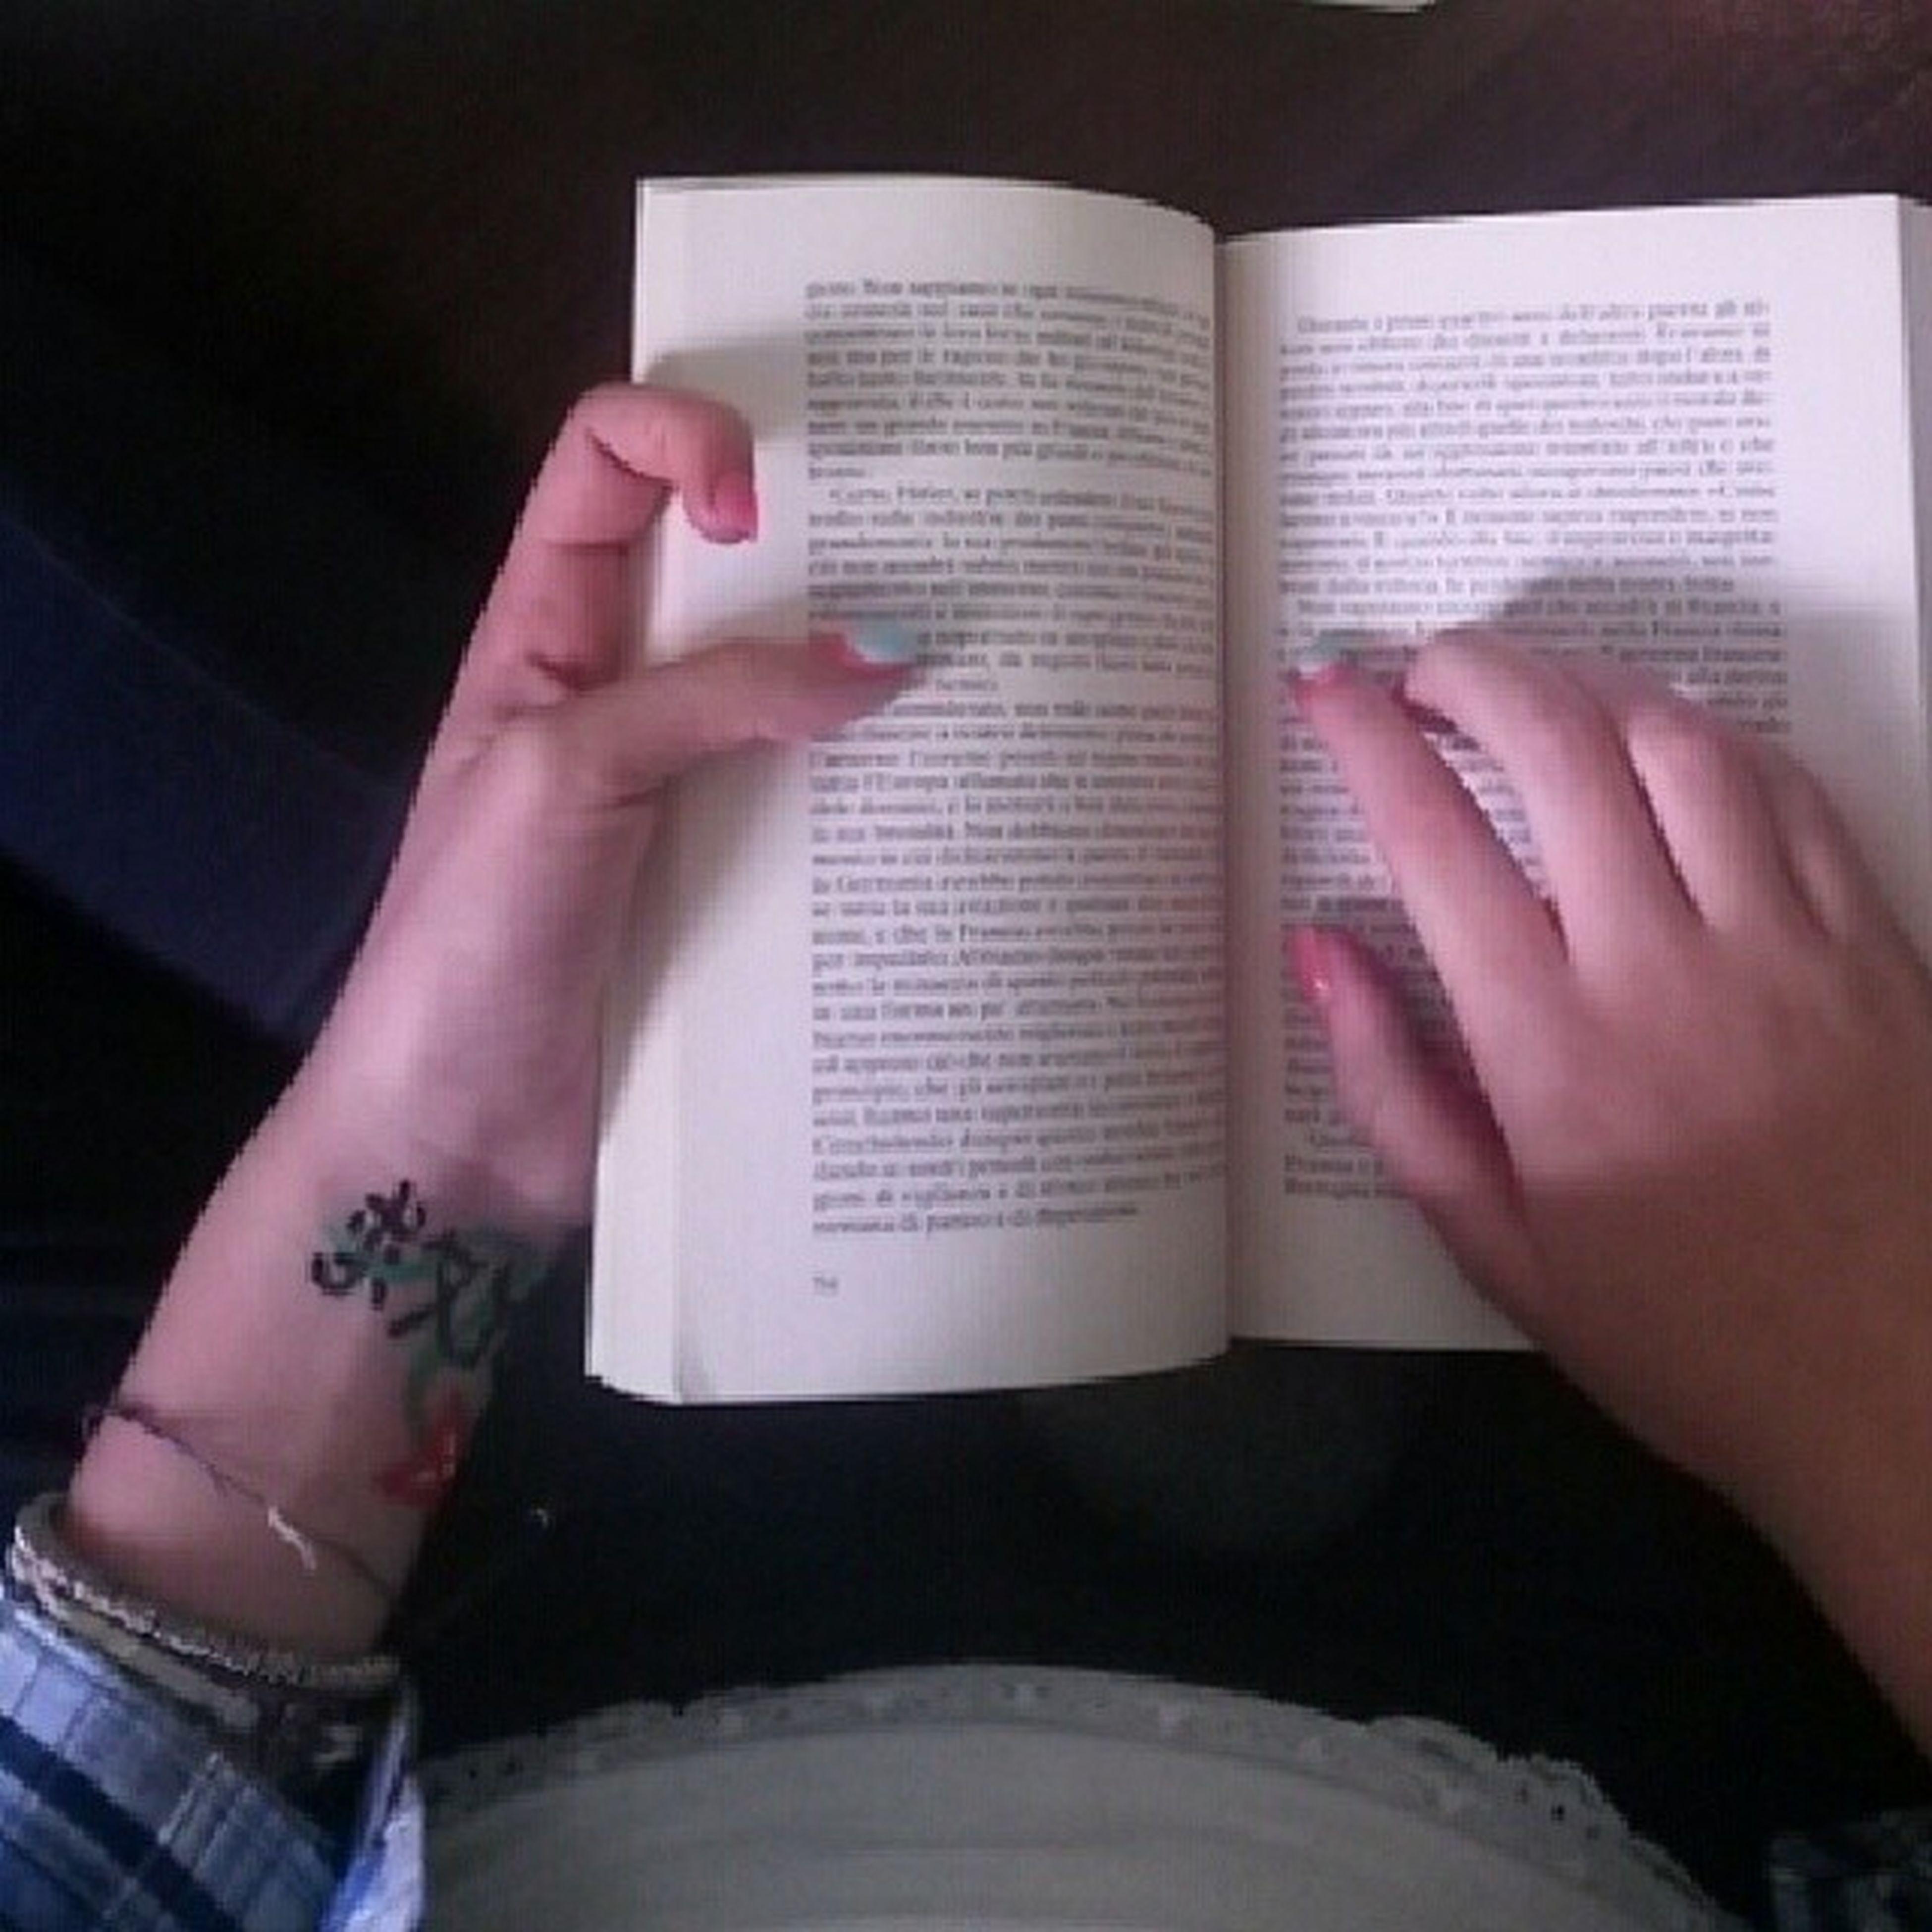 Libro Mistorilassando Leggo Straano mistoaddormentando unghie scrittaincinese salvami salvamiora perchèhopaura TagsForLikes lecosebelle vaado ciaao ♡♡